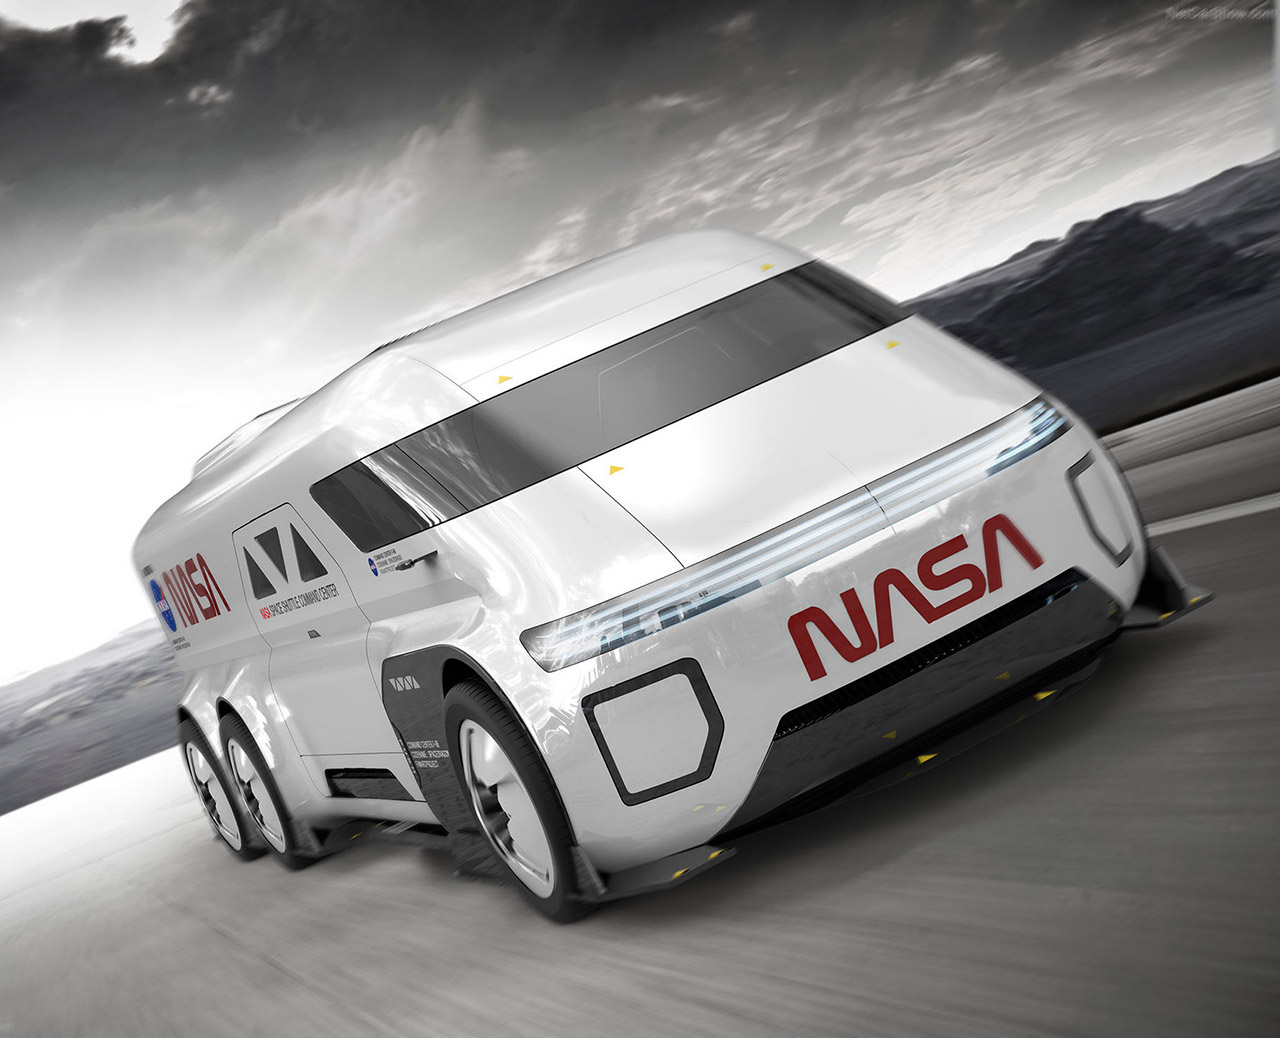 NASA Astronaut Transporter